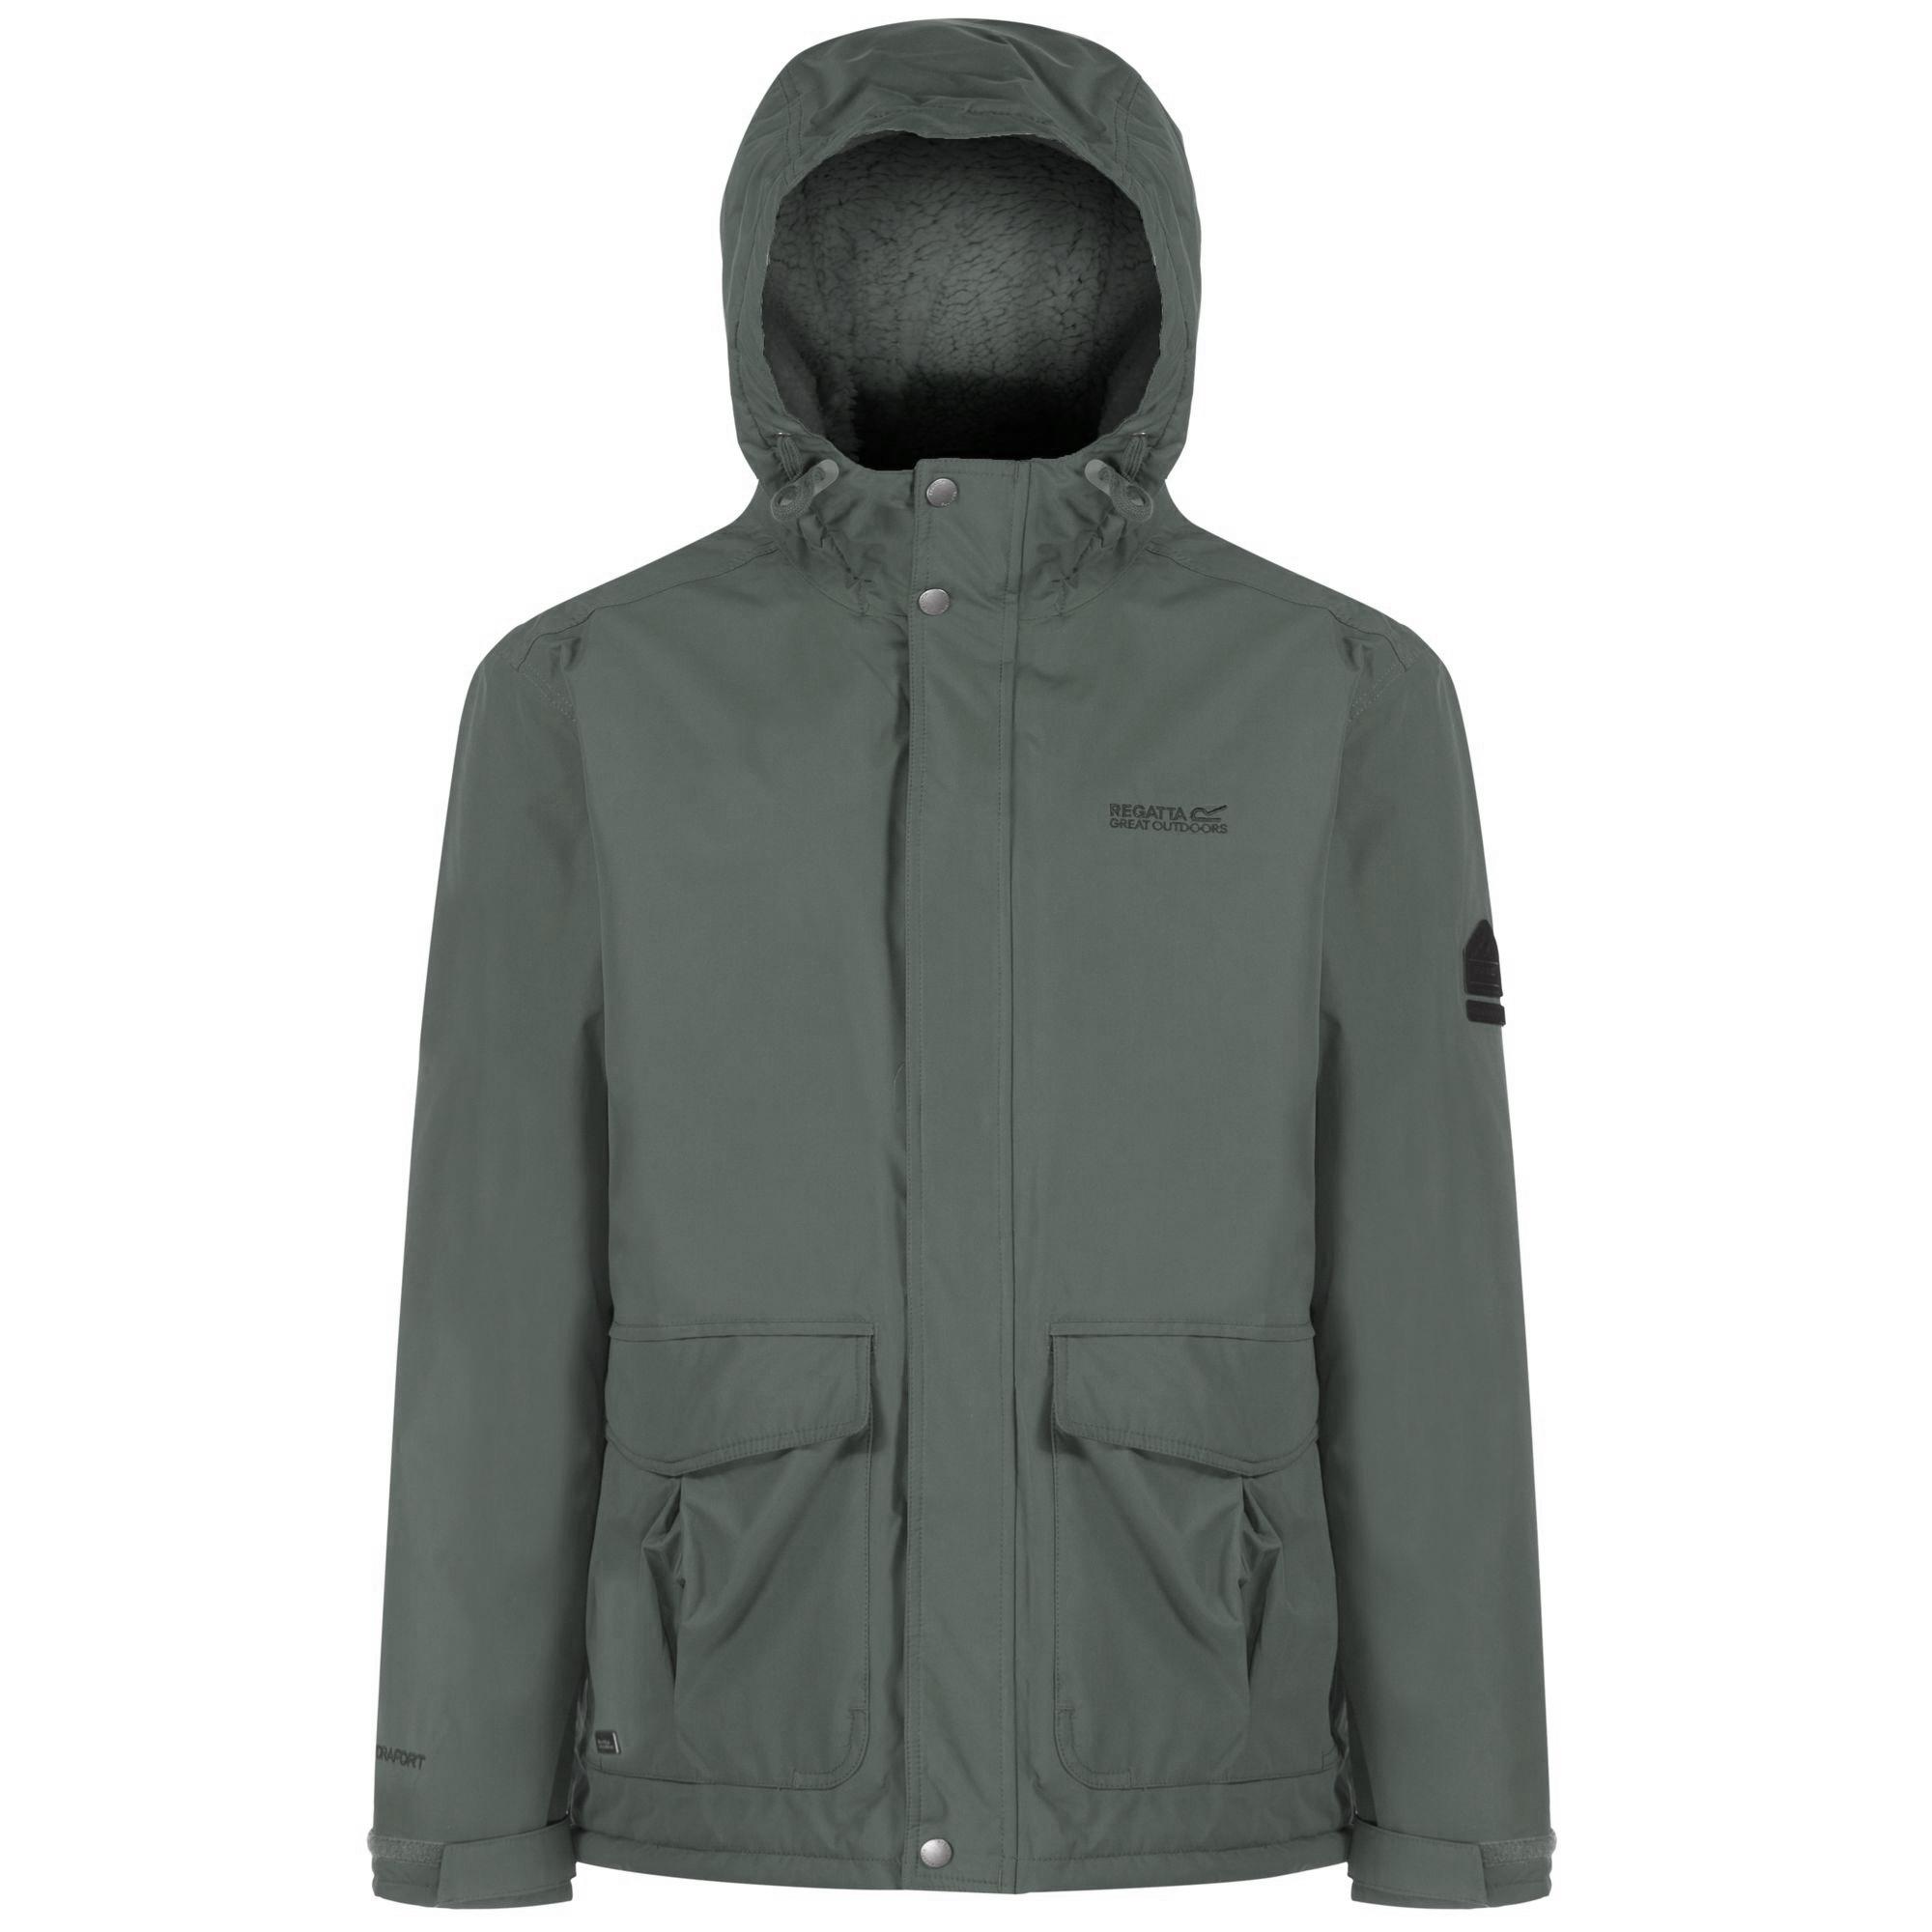 Mens regatta jacket - Regatta Great Outdoors Mens Heritage Sternway Waterproof Jacket